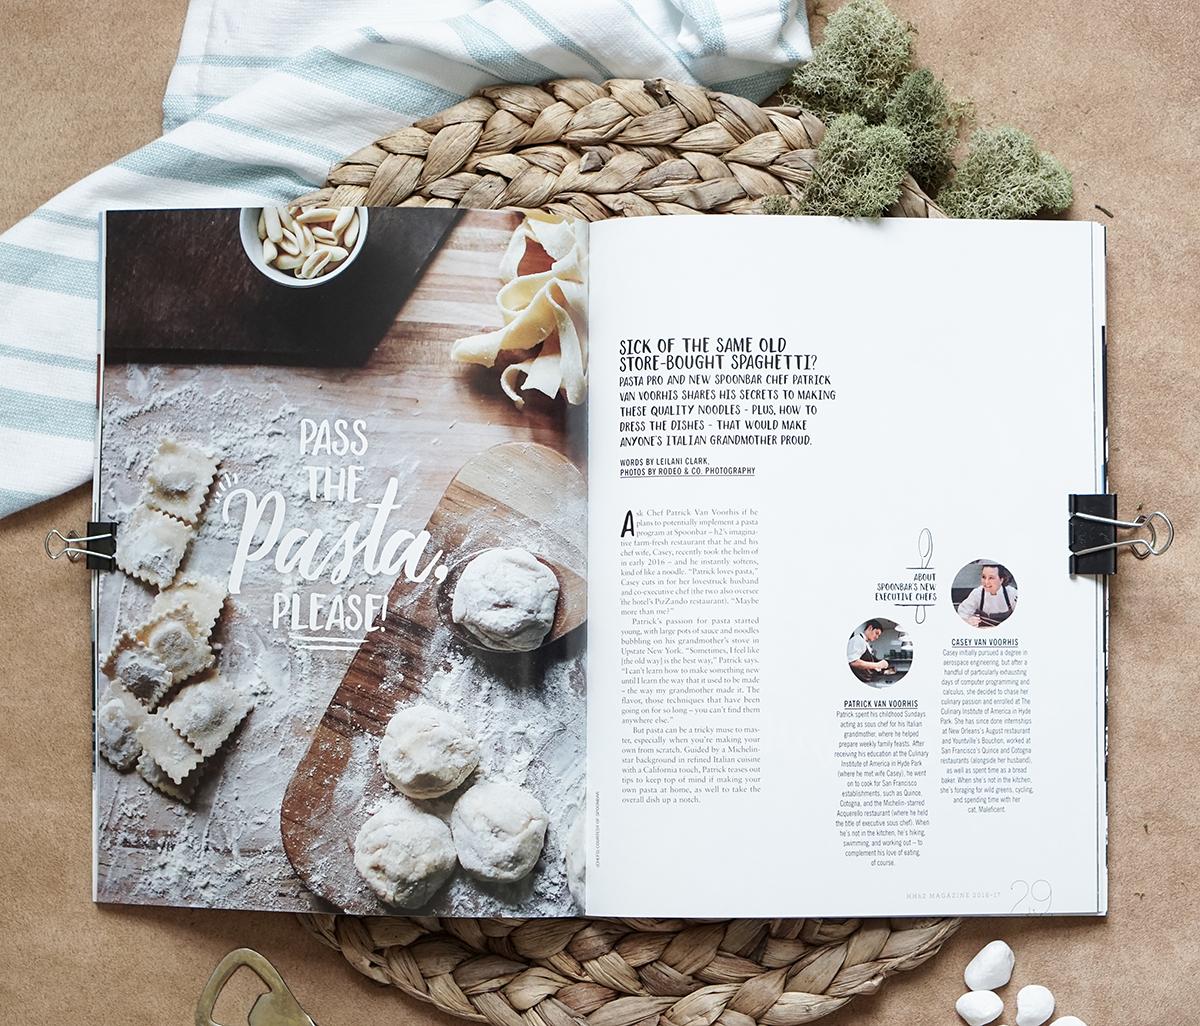 Feature Layout: Hotel Healdsburg Magazine. Pass the Pasta Please